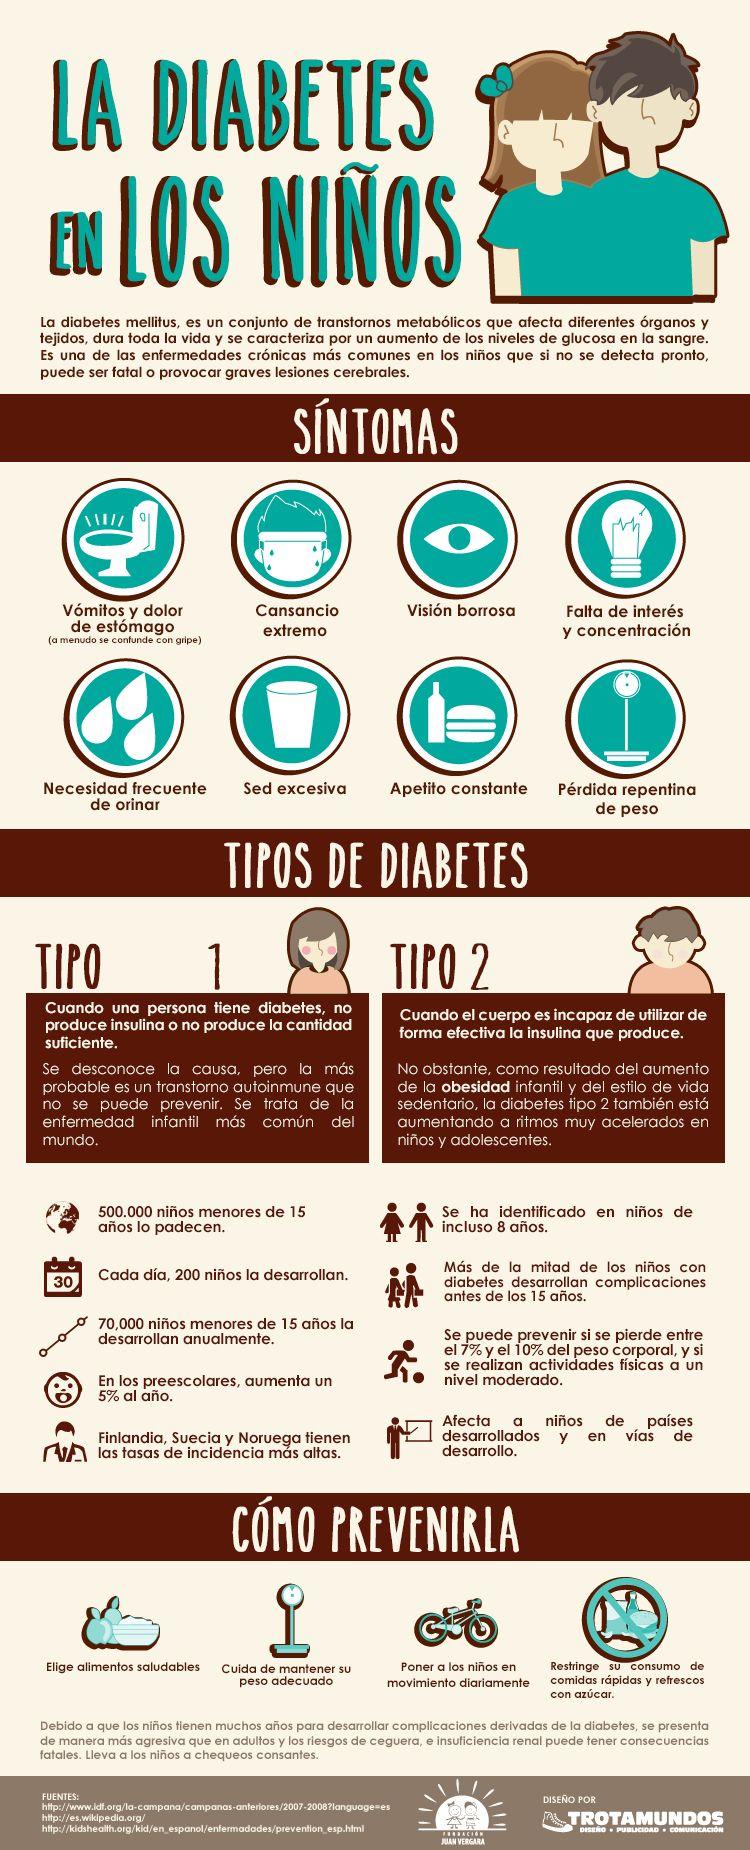 #Infografia La Diabetes en los Niños